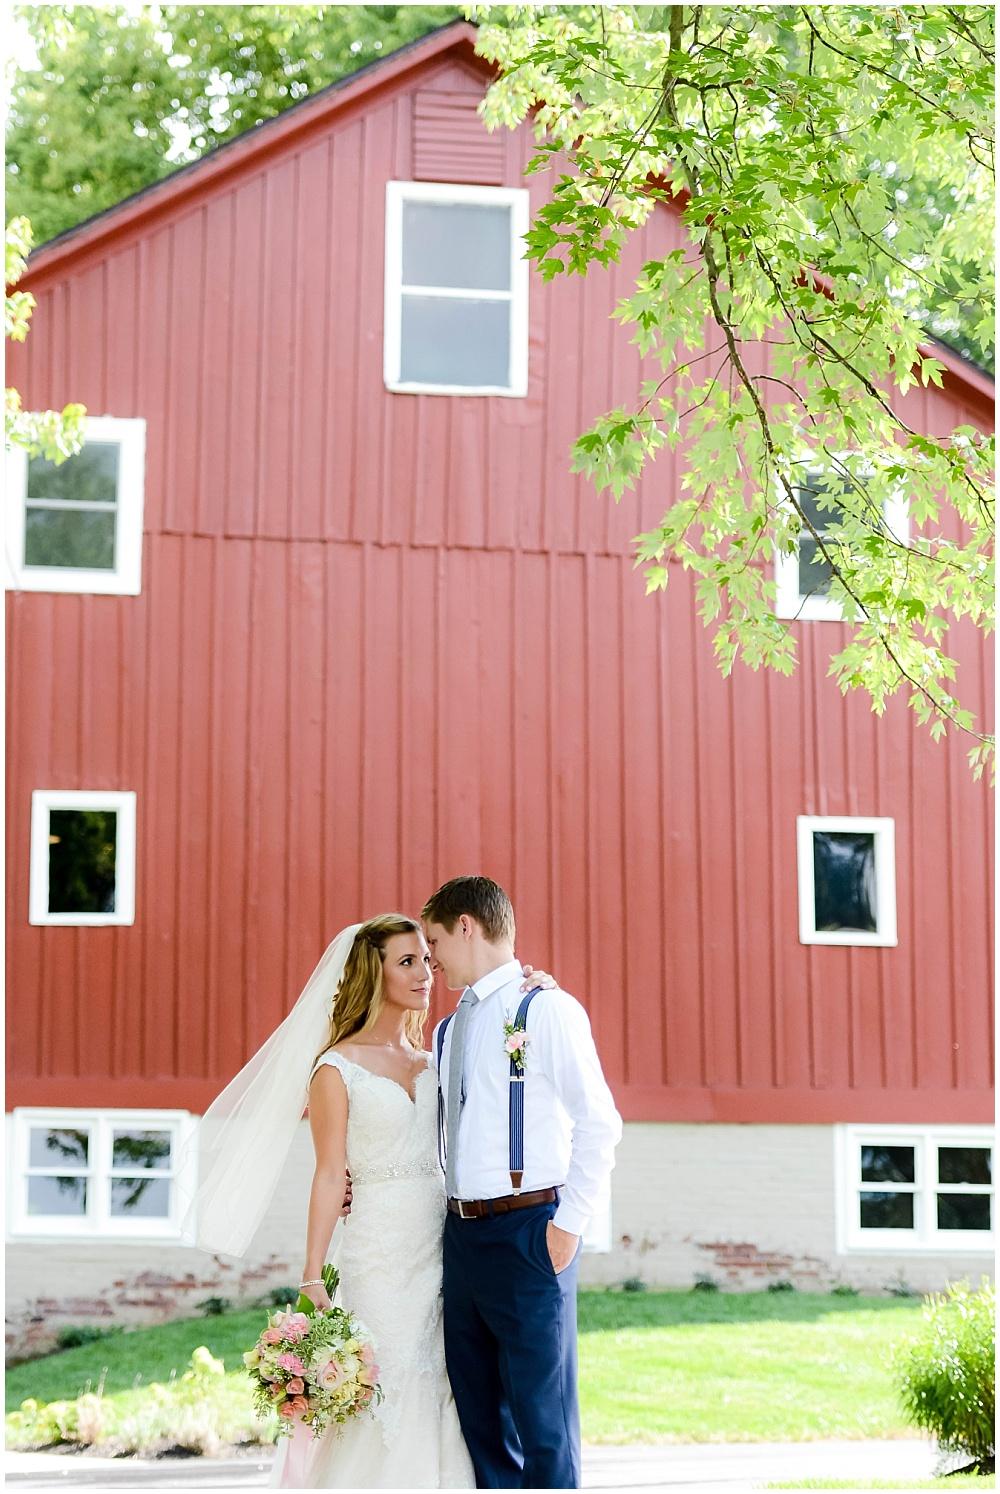 Bride and Groom barn portraits | Mustard Seed Gardens Wedding by Sara Ackermann Photography & Jessica Dum Wedding Coordination